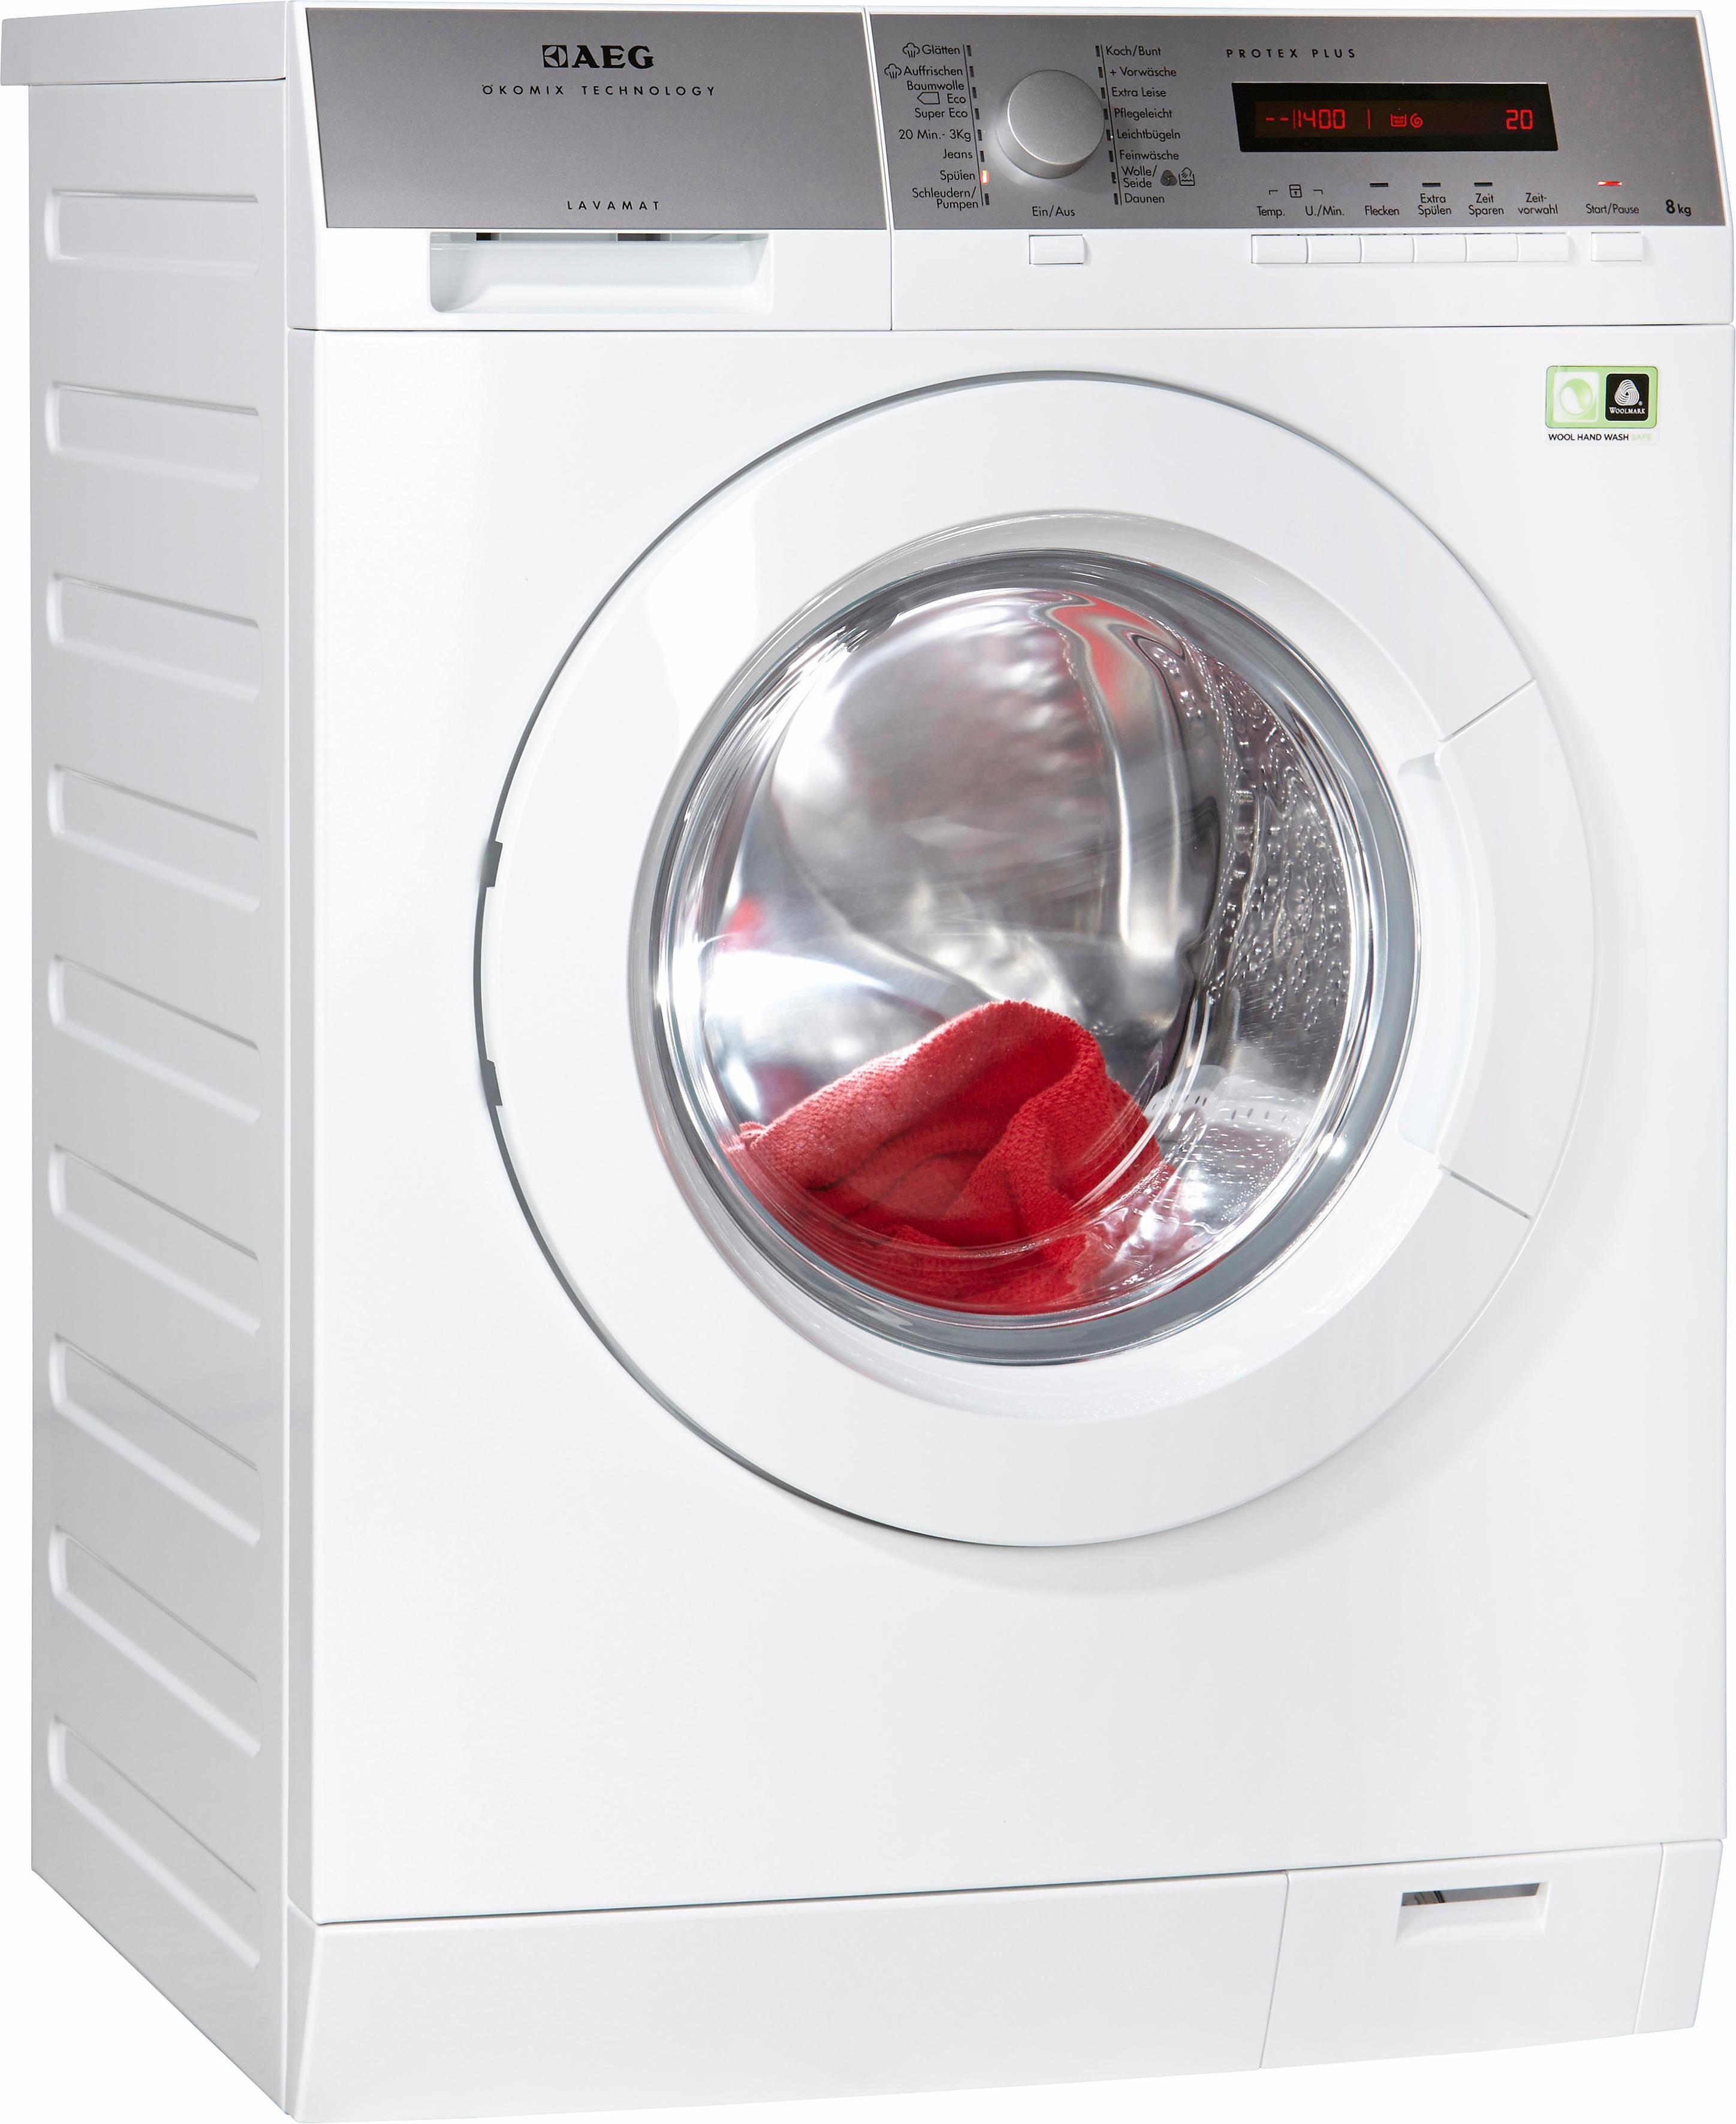 AEG Waschmaschine Lavamat L79485FL, A+++, 8 kg, 1400 U/Min